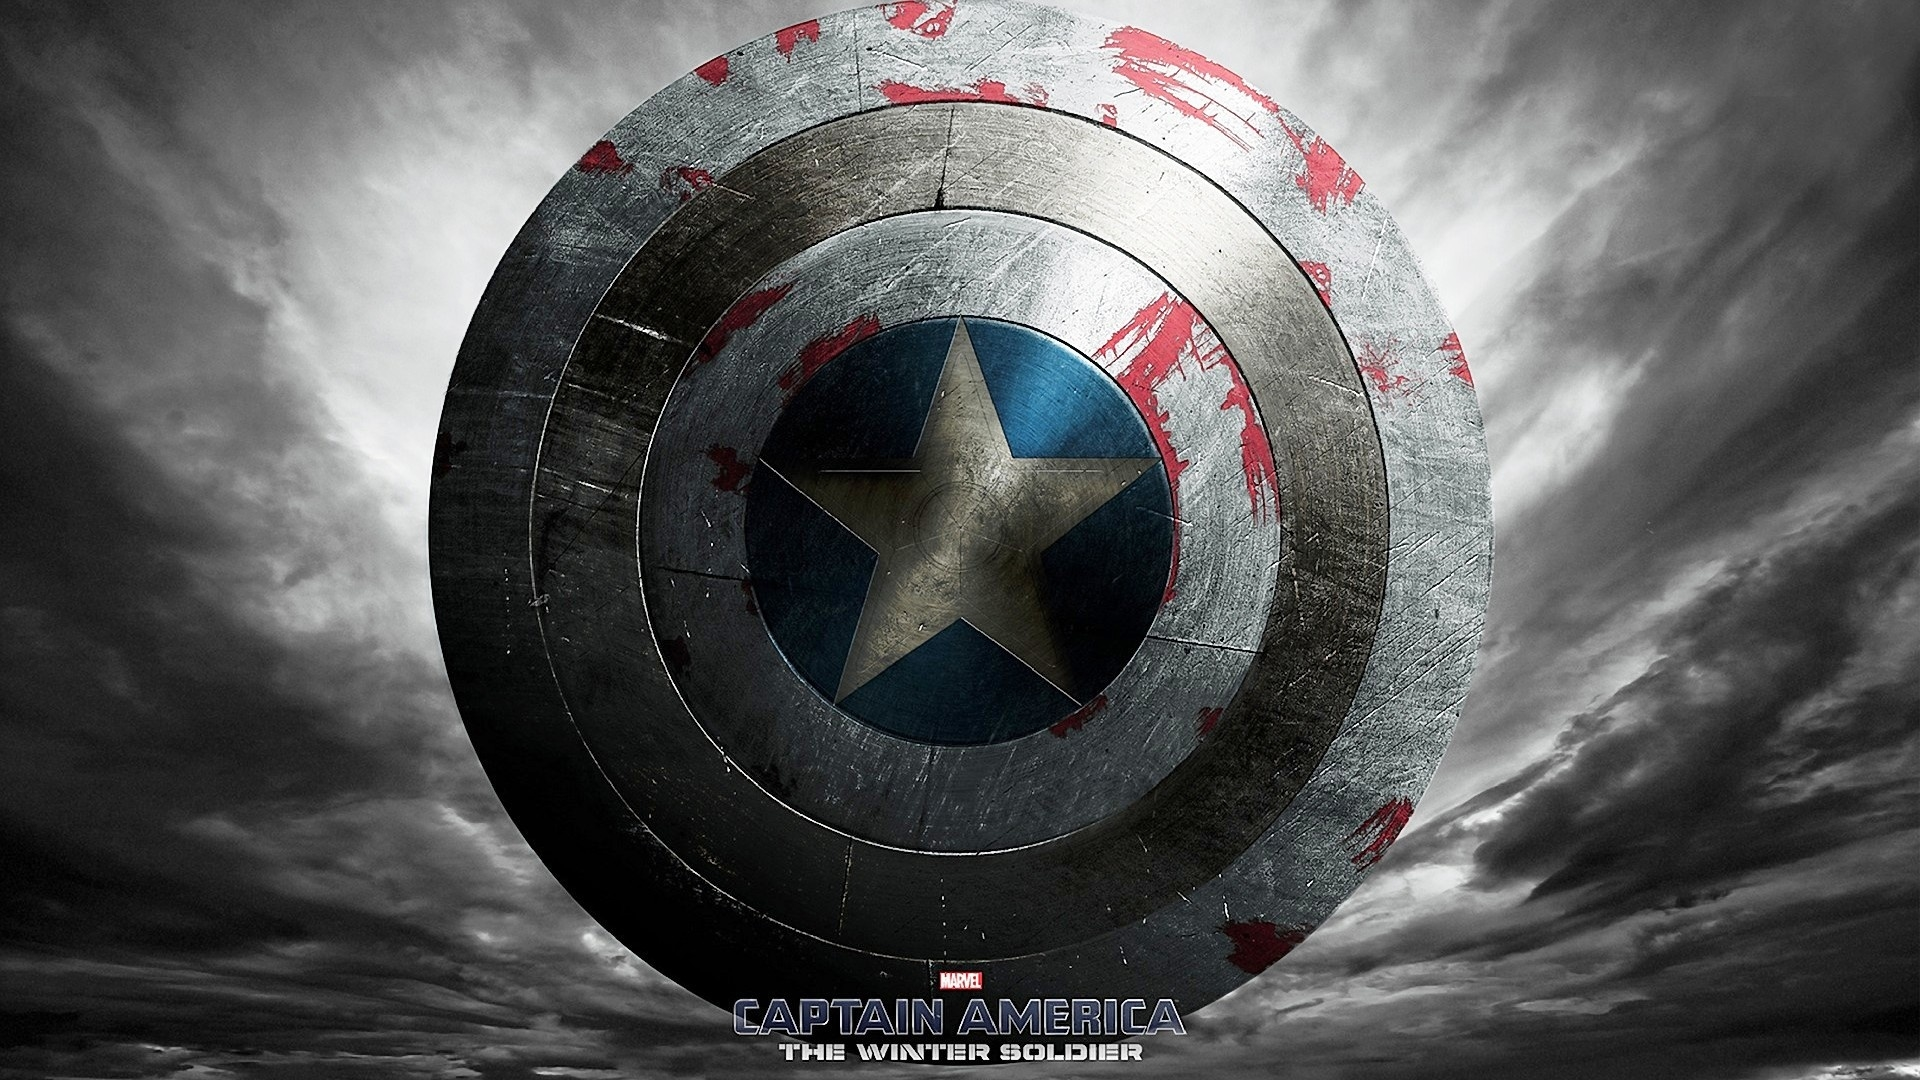 Captain America Shield Iphone Wallpaper 1920x1080